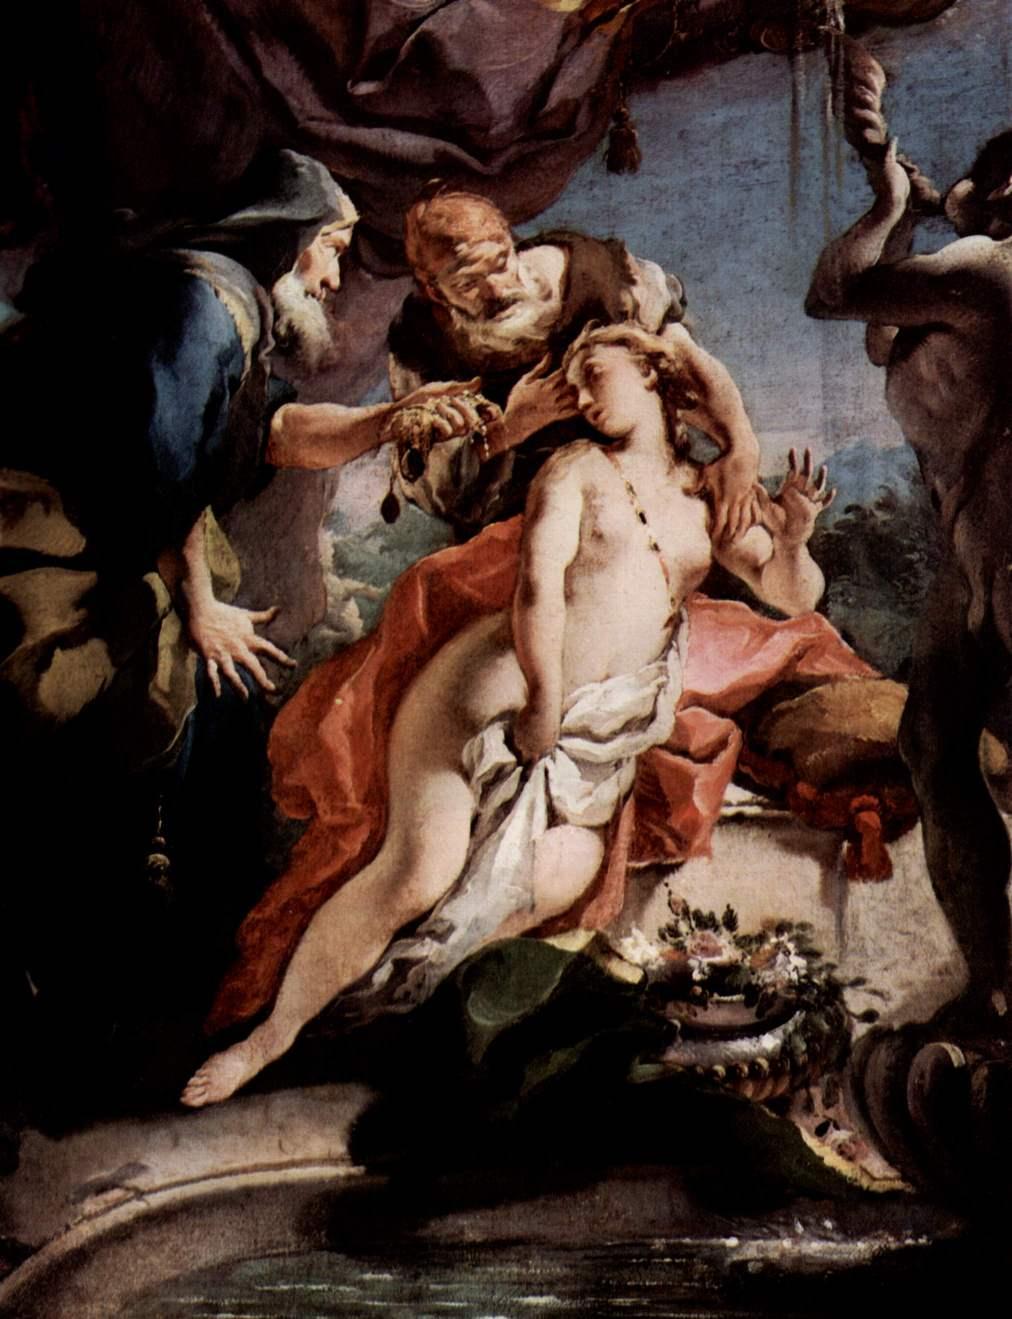 http://2.bp.blogspot.com/-tJntV74KDKw/TrciRdu2dSI/AAAAAAAAE84/HiLFVYxhKDU/s1600/Giovanni+Battista+Tiepolo.jpg